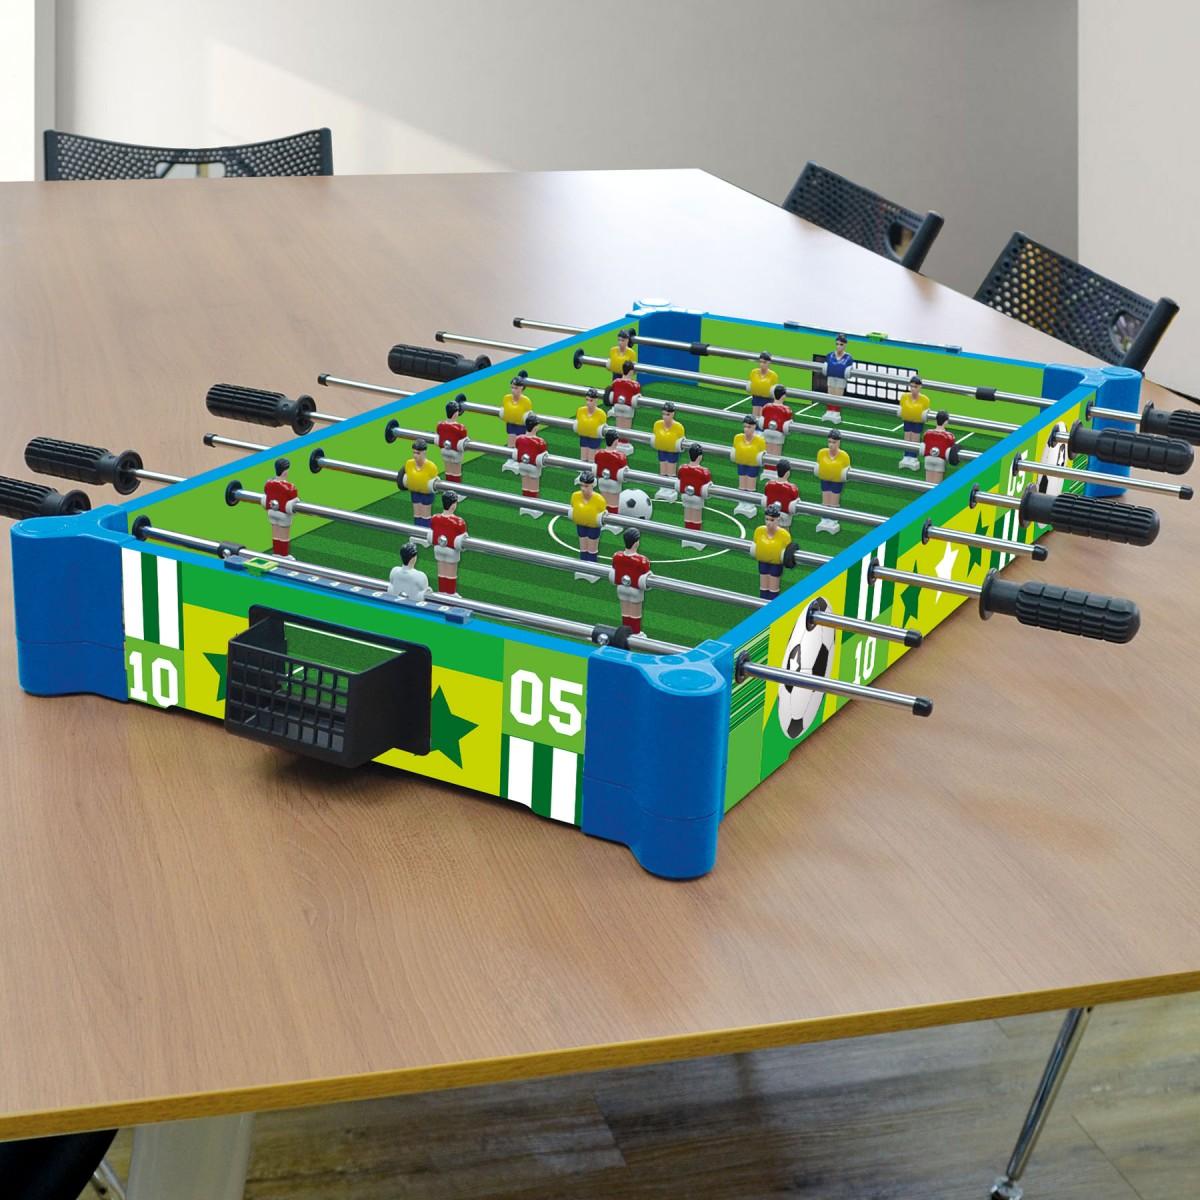 32 82cm 2 In 1 Table Tabletop Football Foosball Soccer